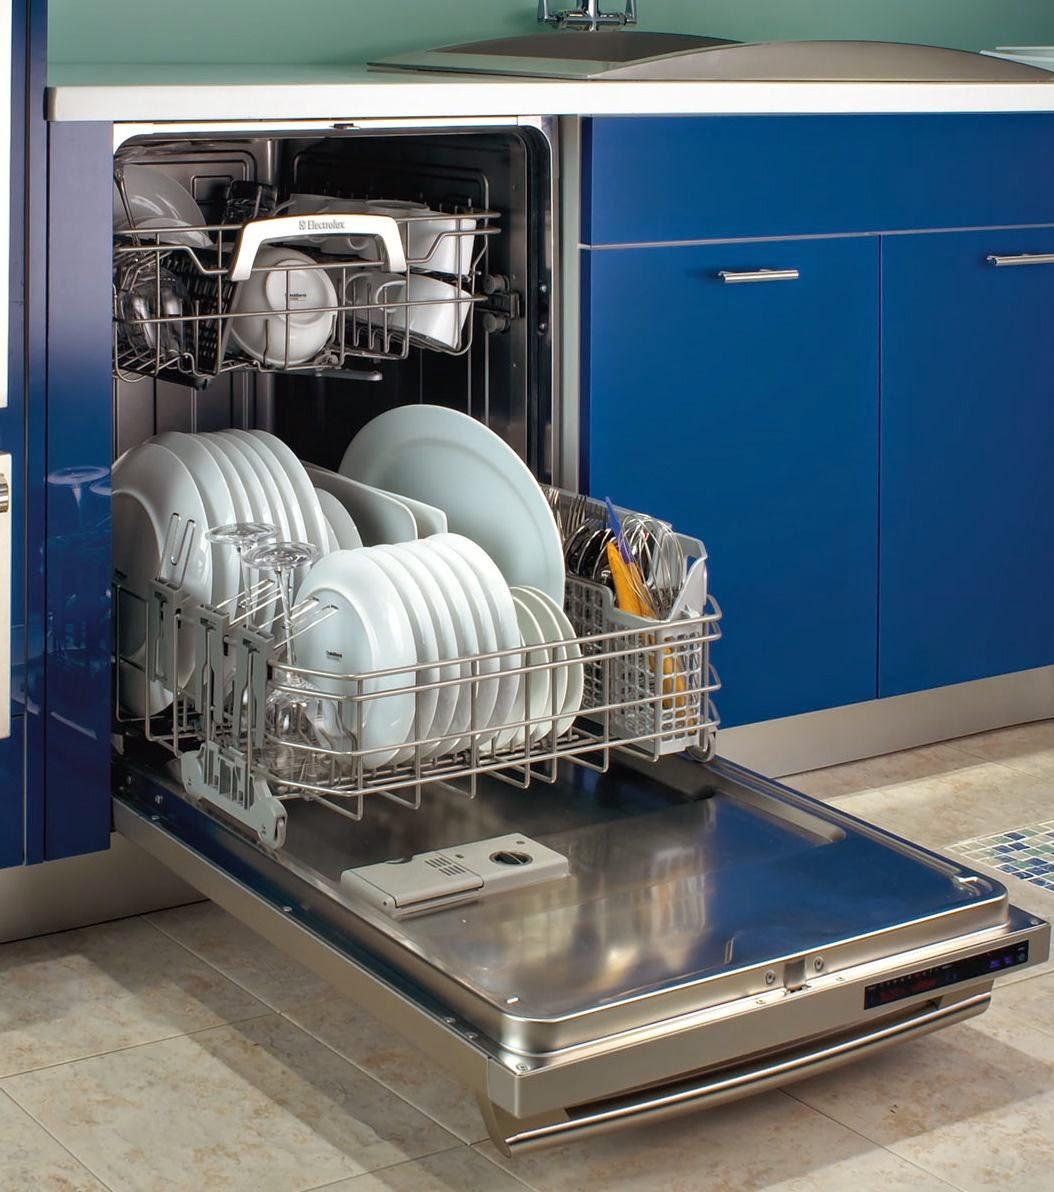 American Dishwasher- Electrolux